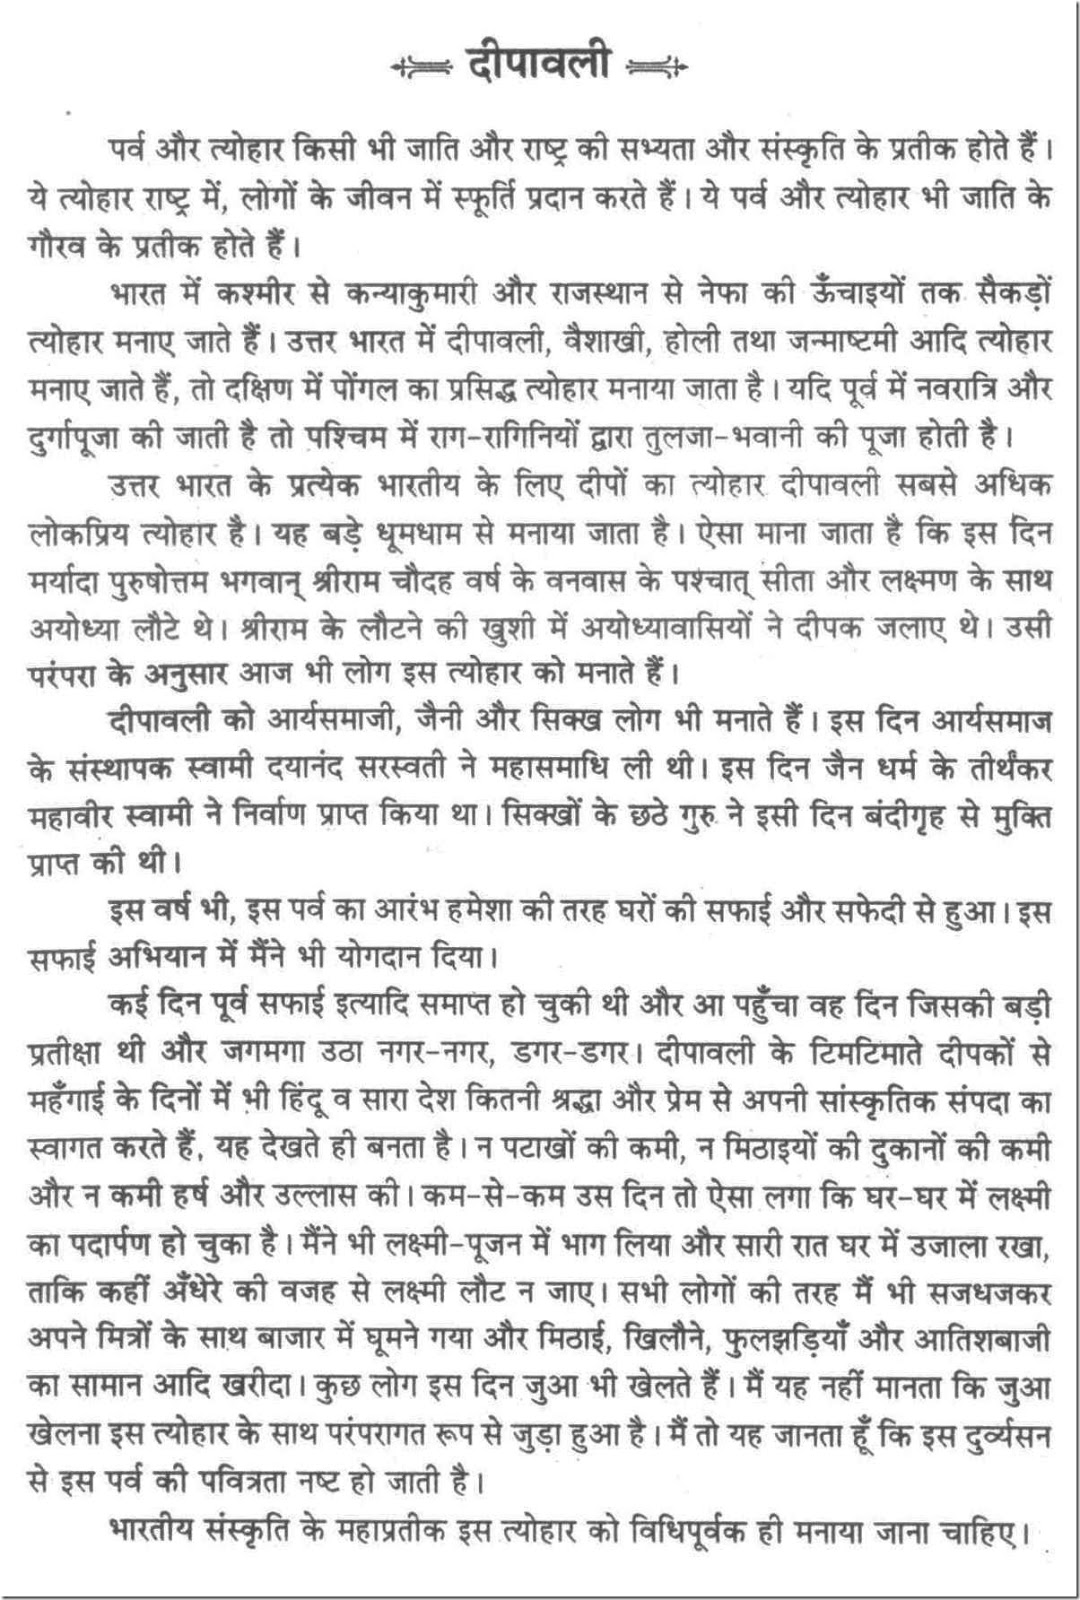 essay on diwali in punjabi for class 10